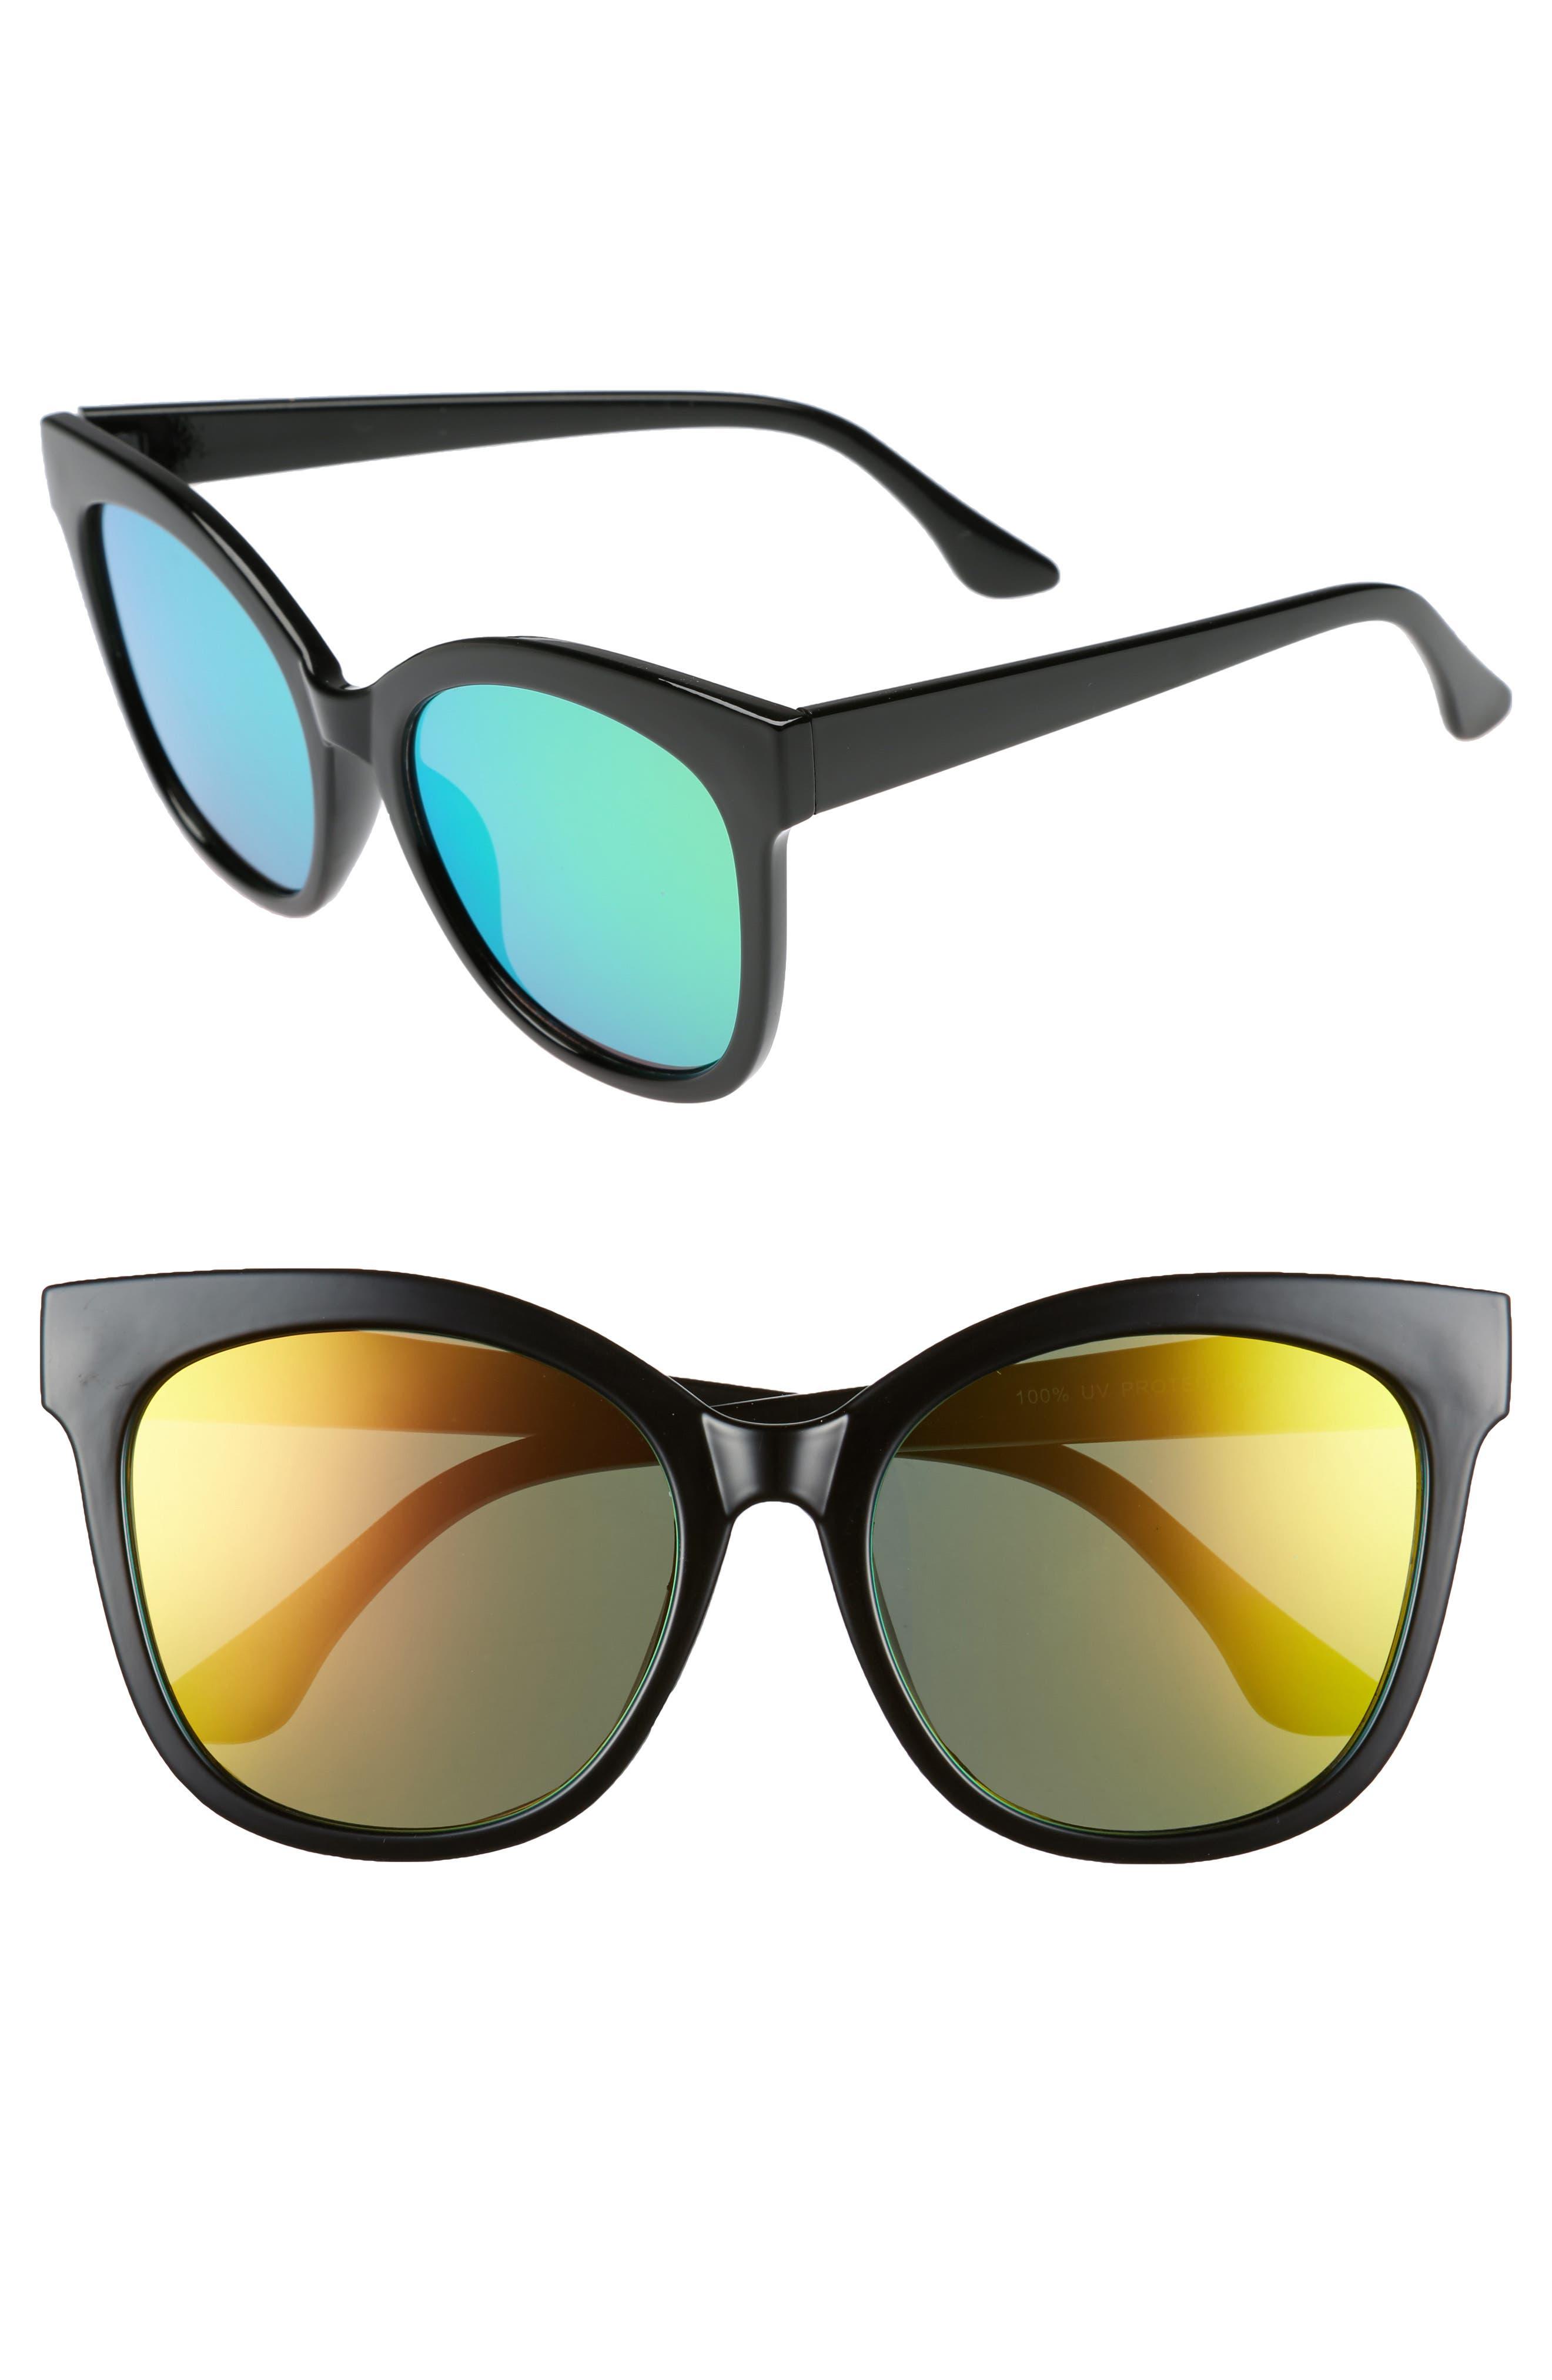 55mm Square Sunglasses,                             Main thumbnail 1, color,                             Black/ Pink